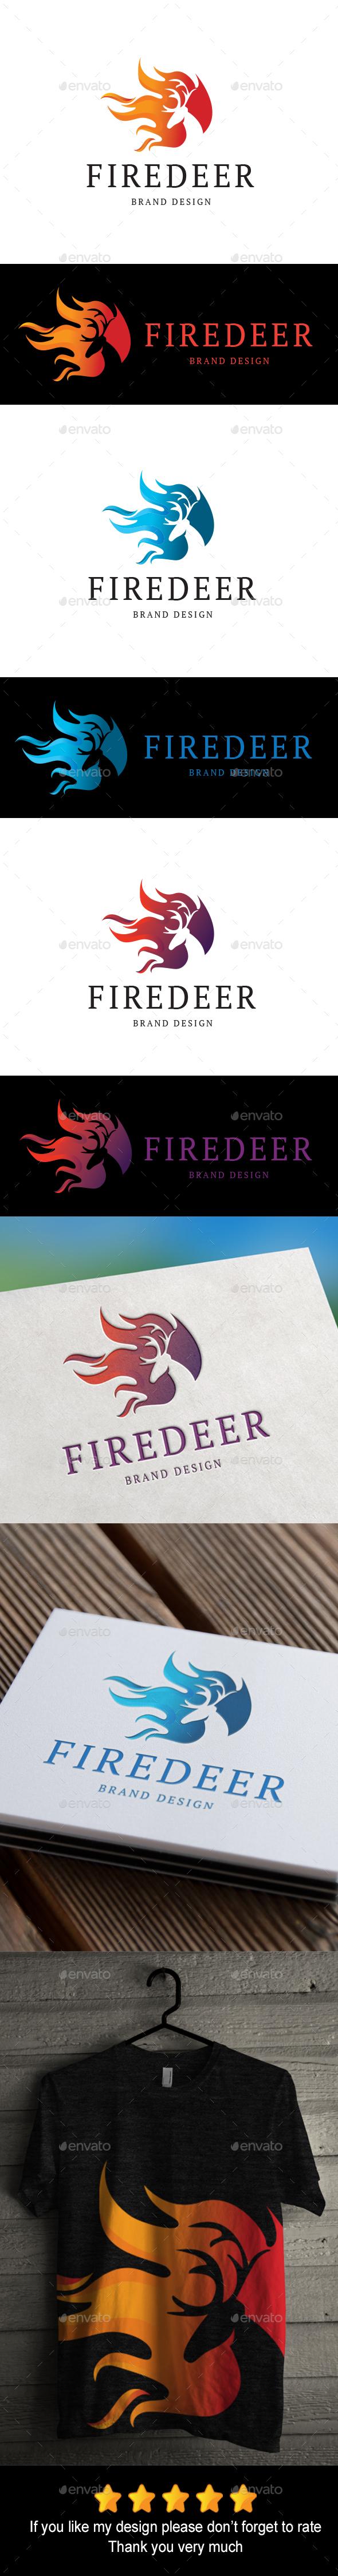 Firedeer Logo - Animals Logo Templates